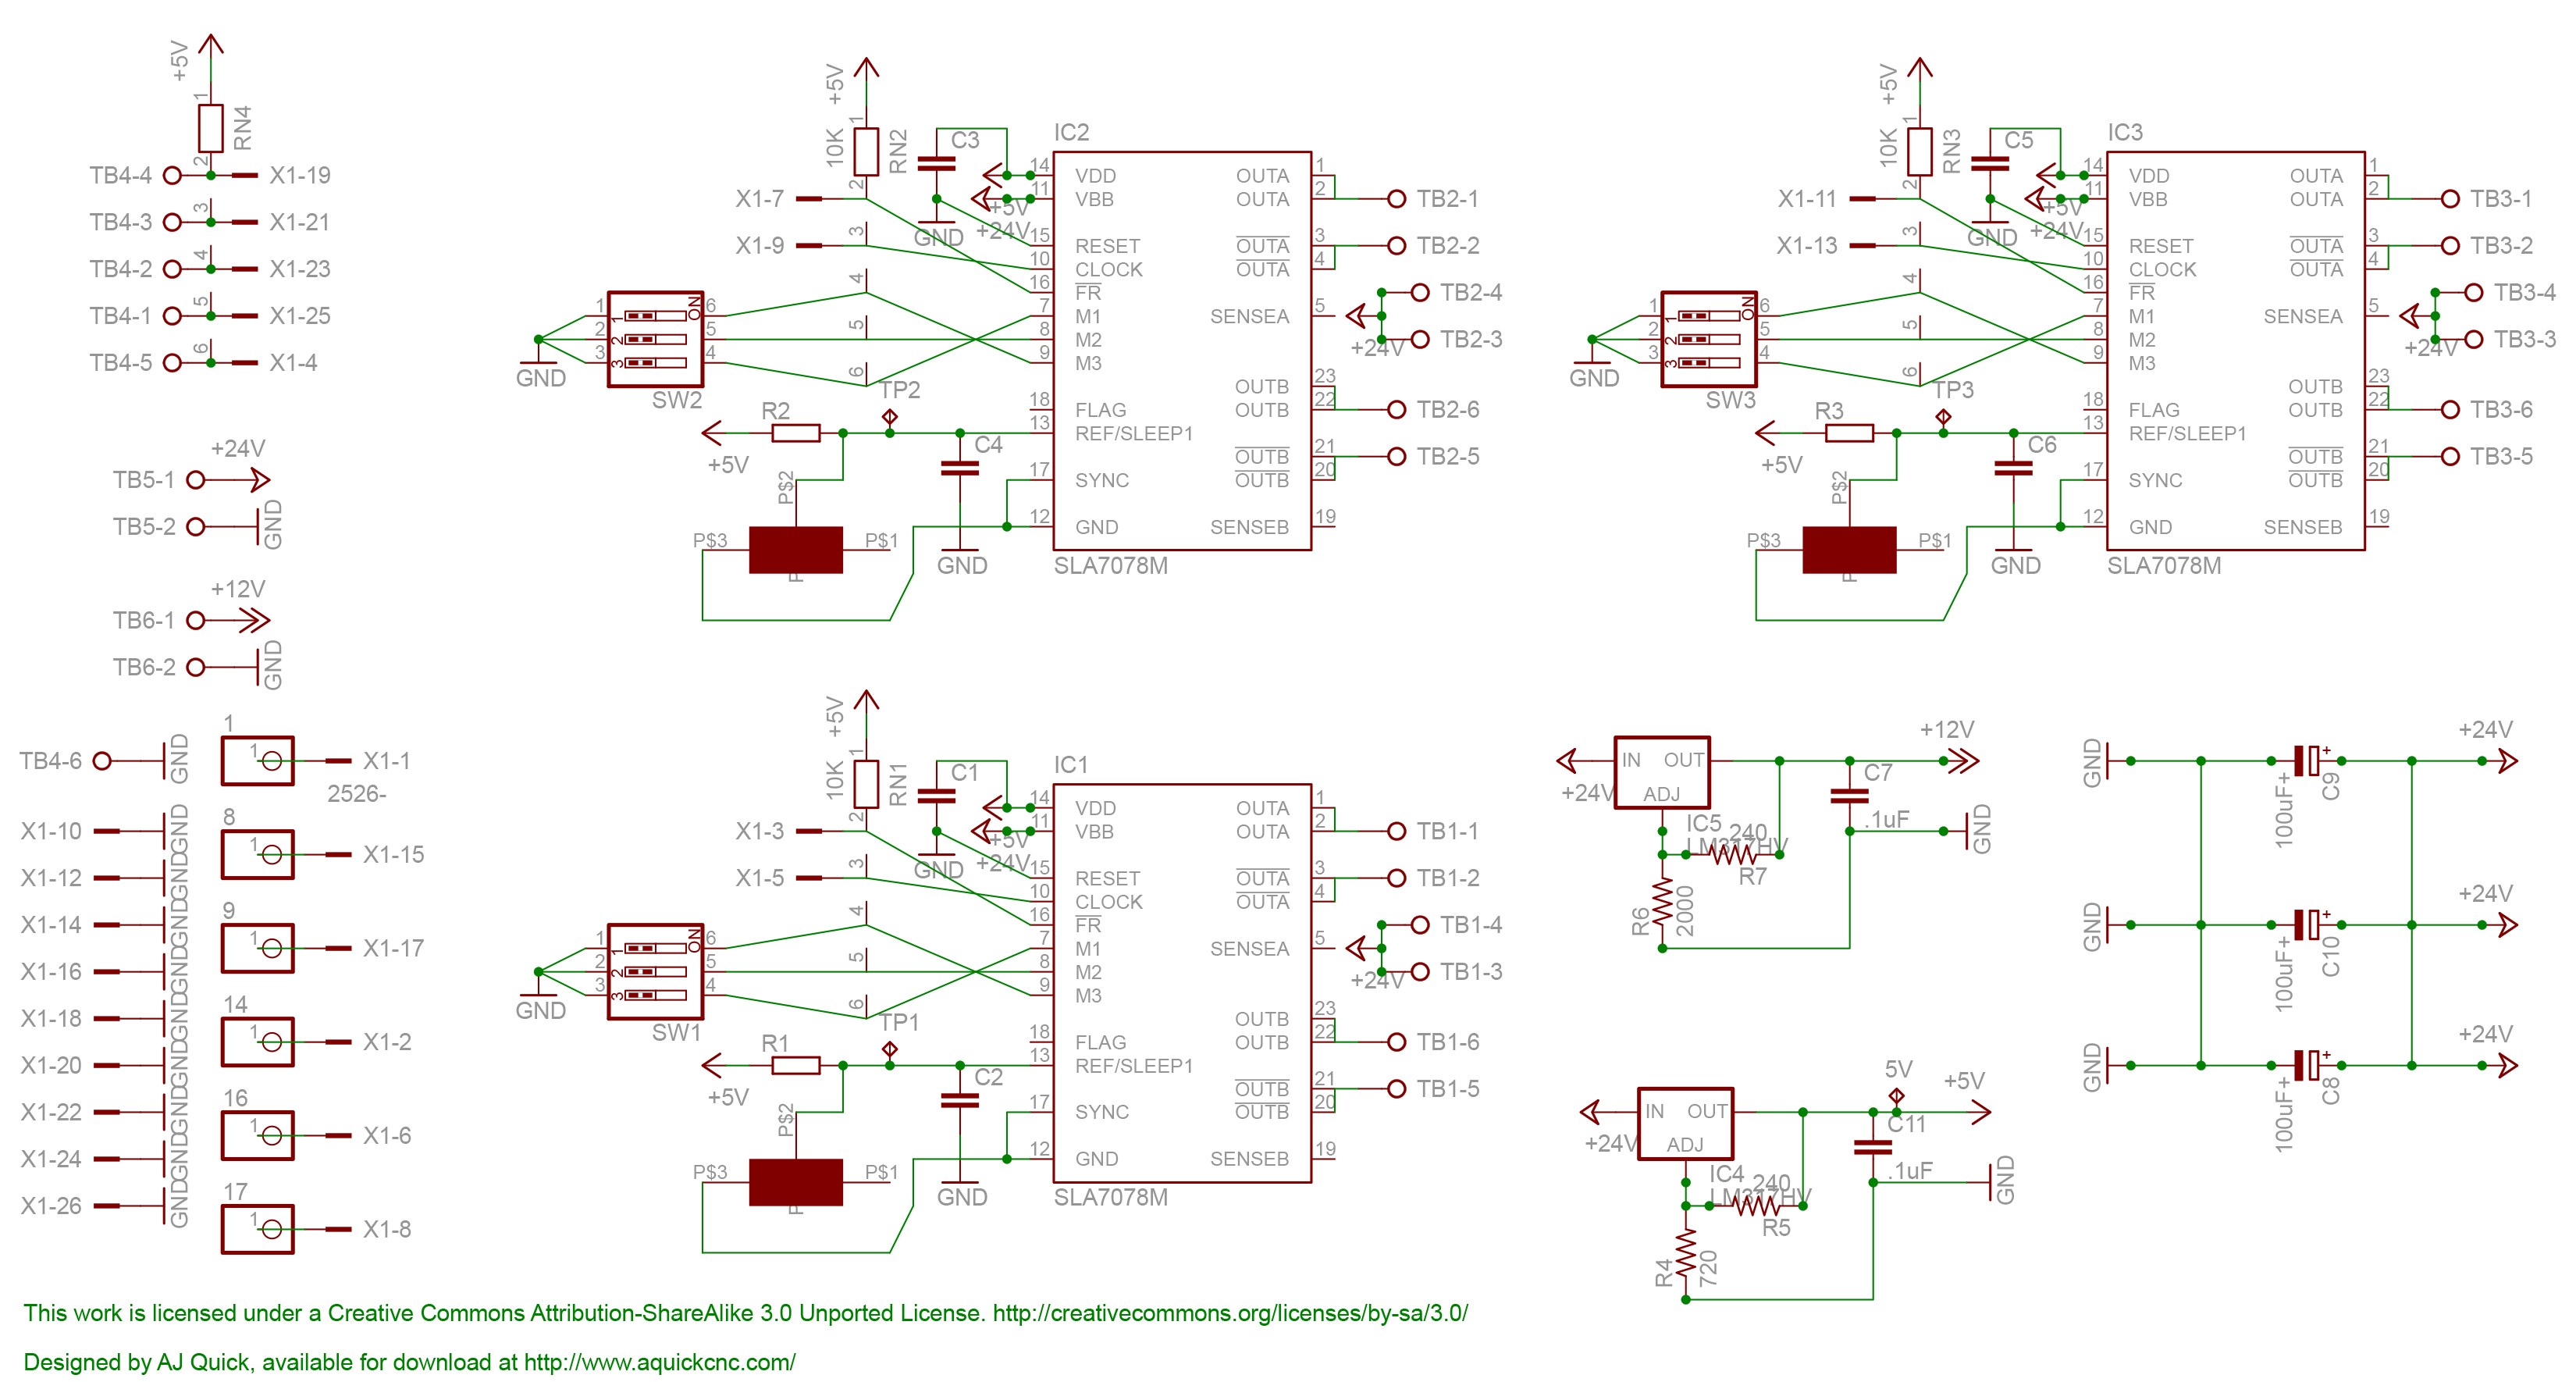 3_Axis_DIY_CNC_Controller_Schematic diy cnc controller a quick cnc wiki cnc controller wiring diagram at bayanpartner.co